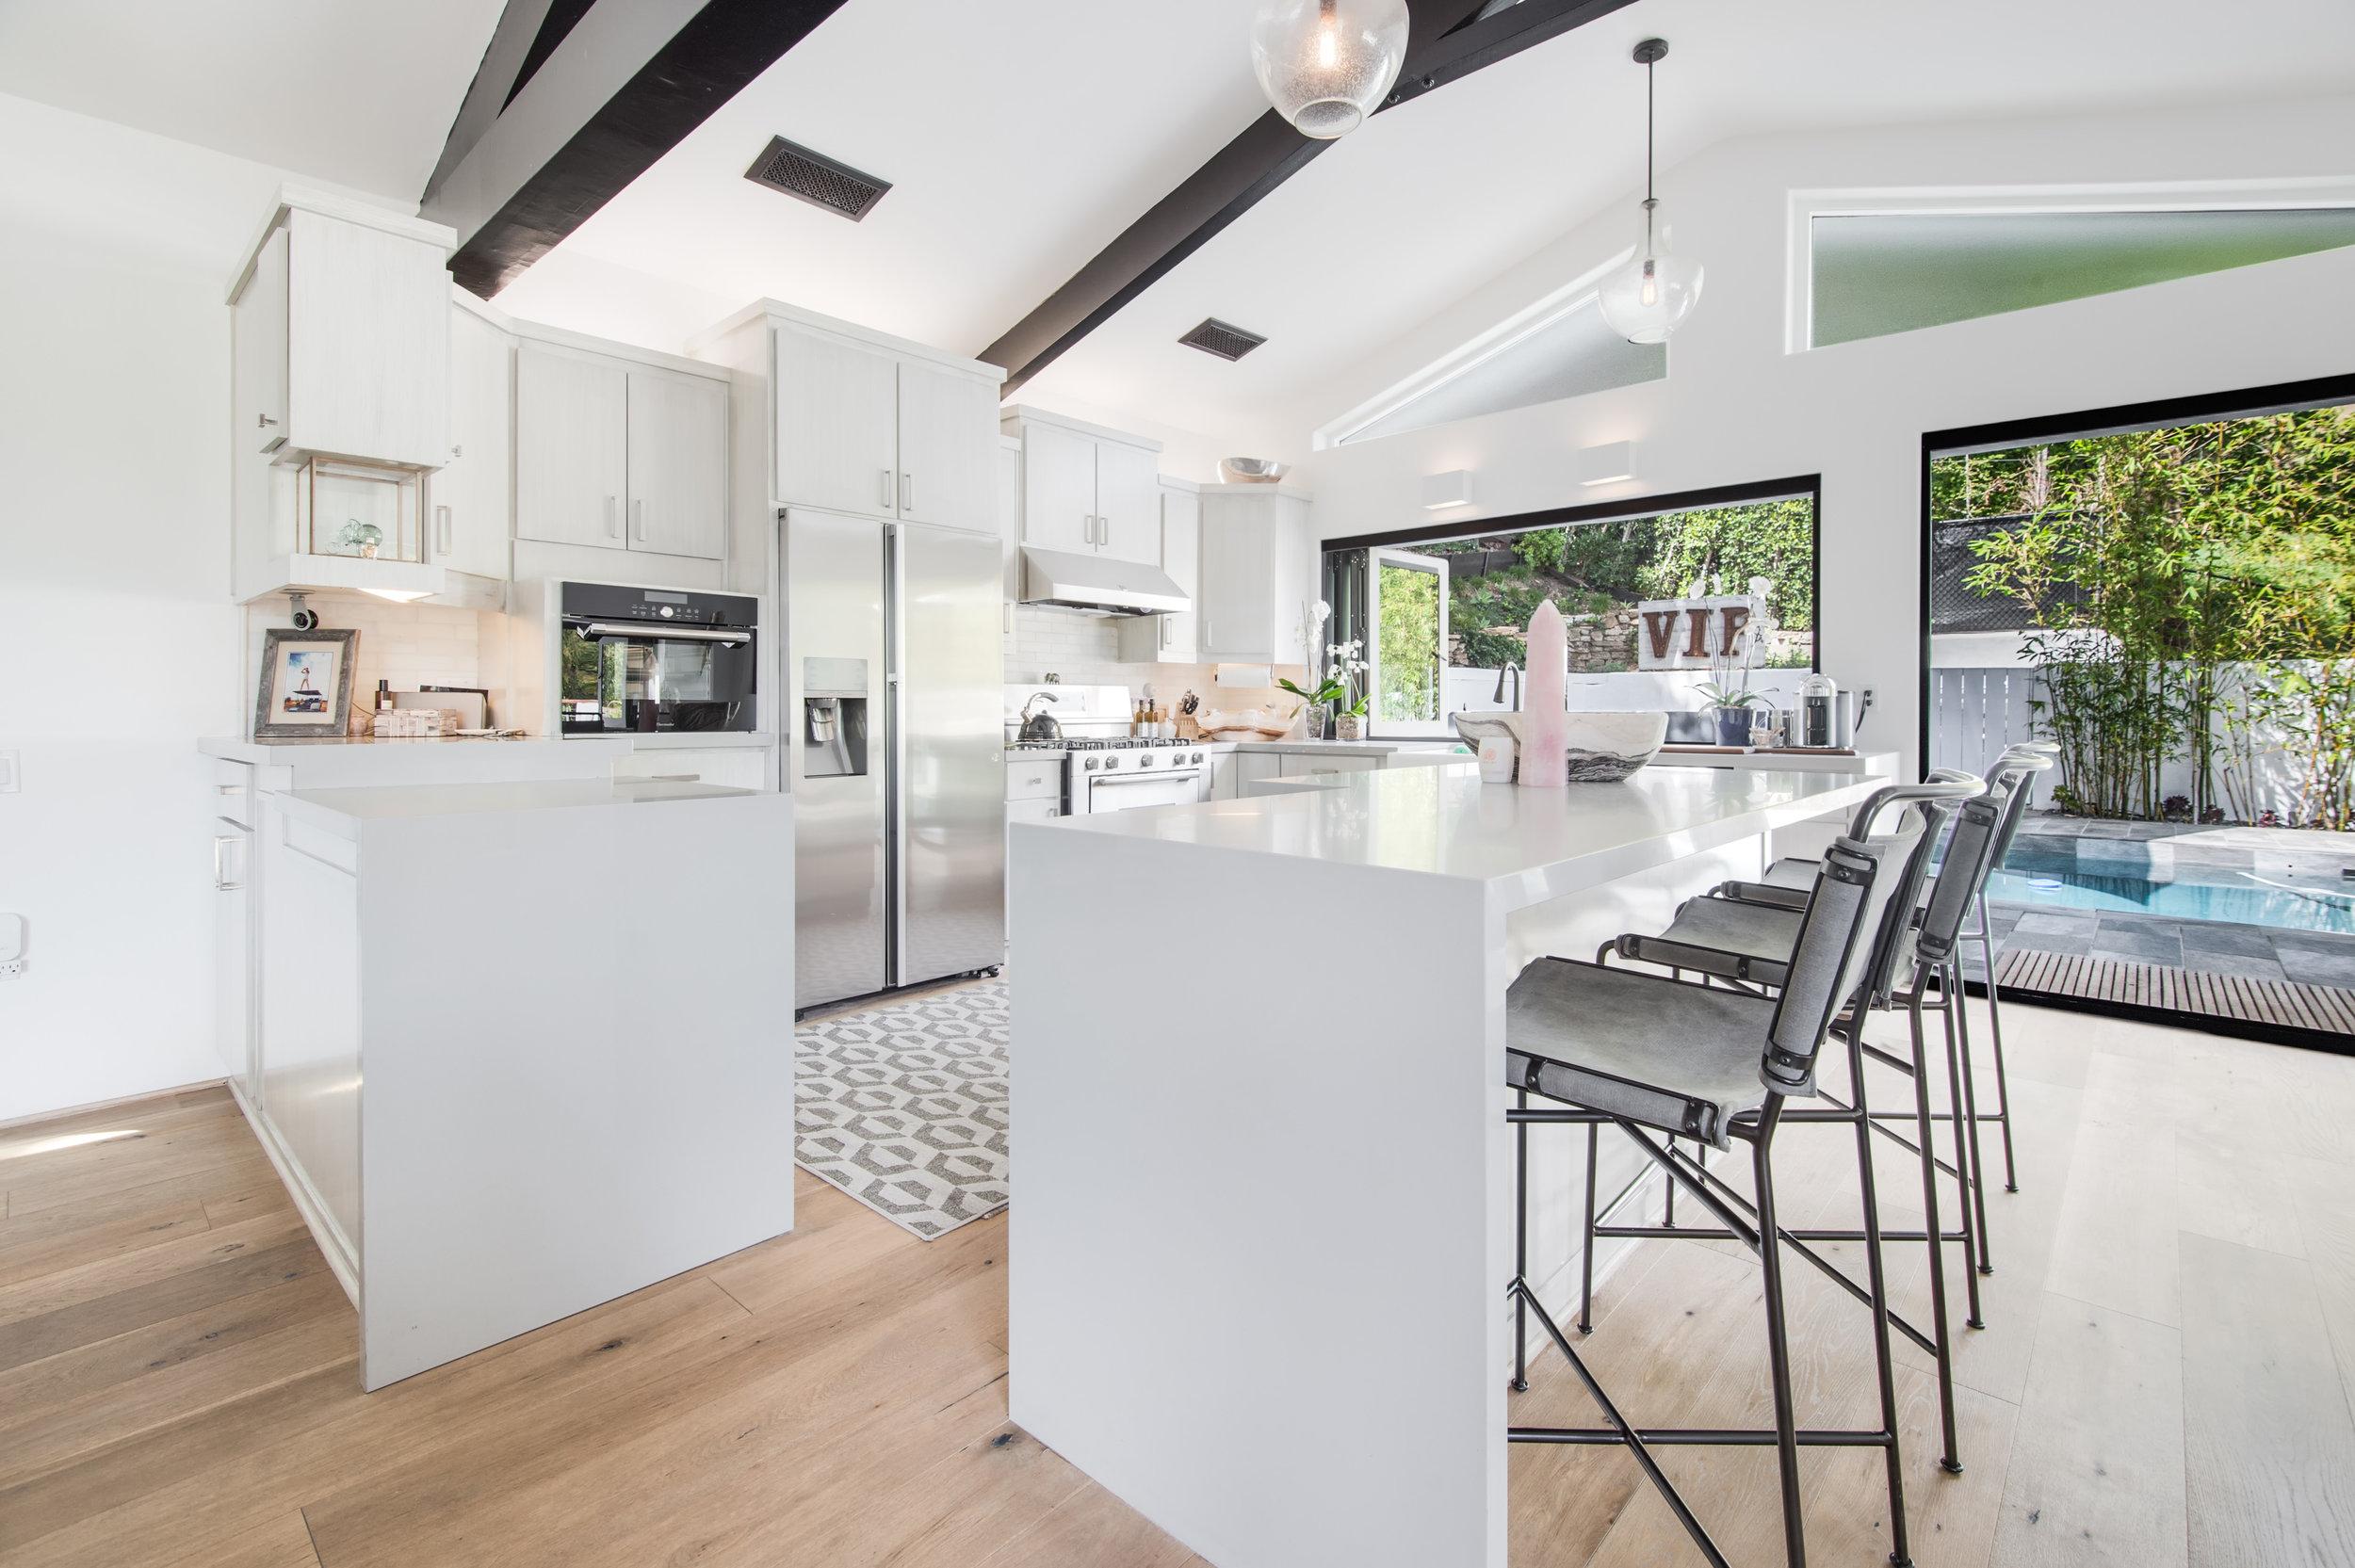 012 Kitchen 26272 Cool Glen Way Malibu For Sale Luxury Real Estate.jpg